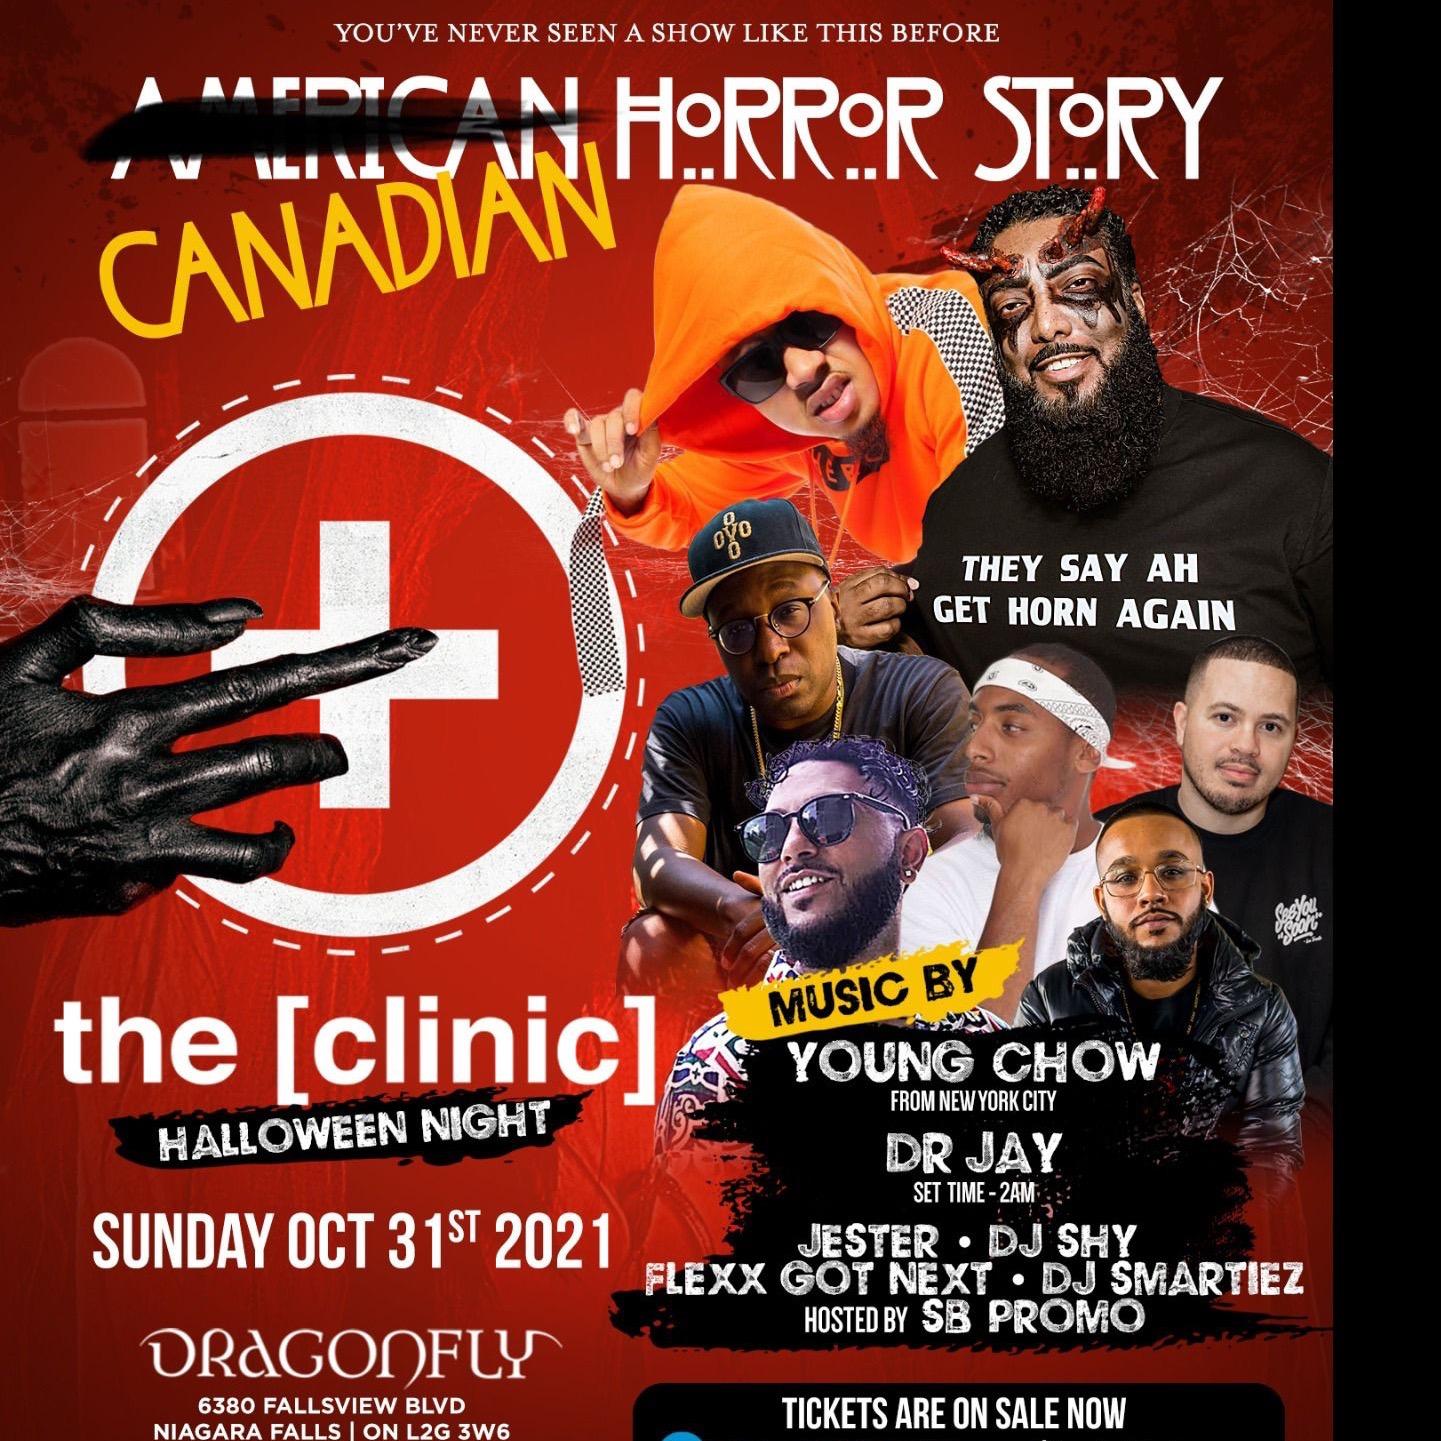 The Clinic - Halloween